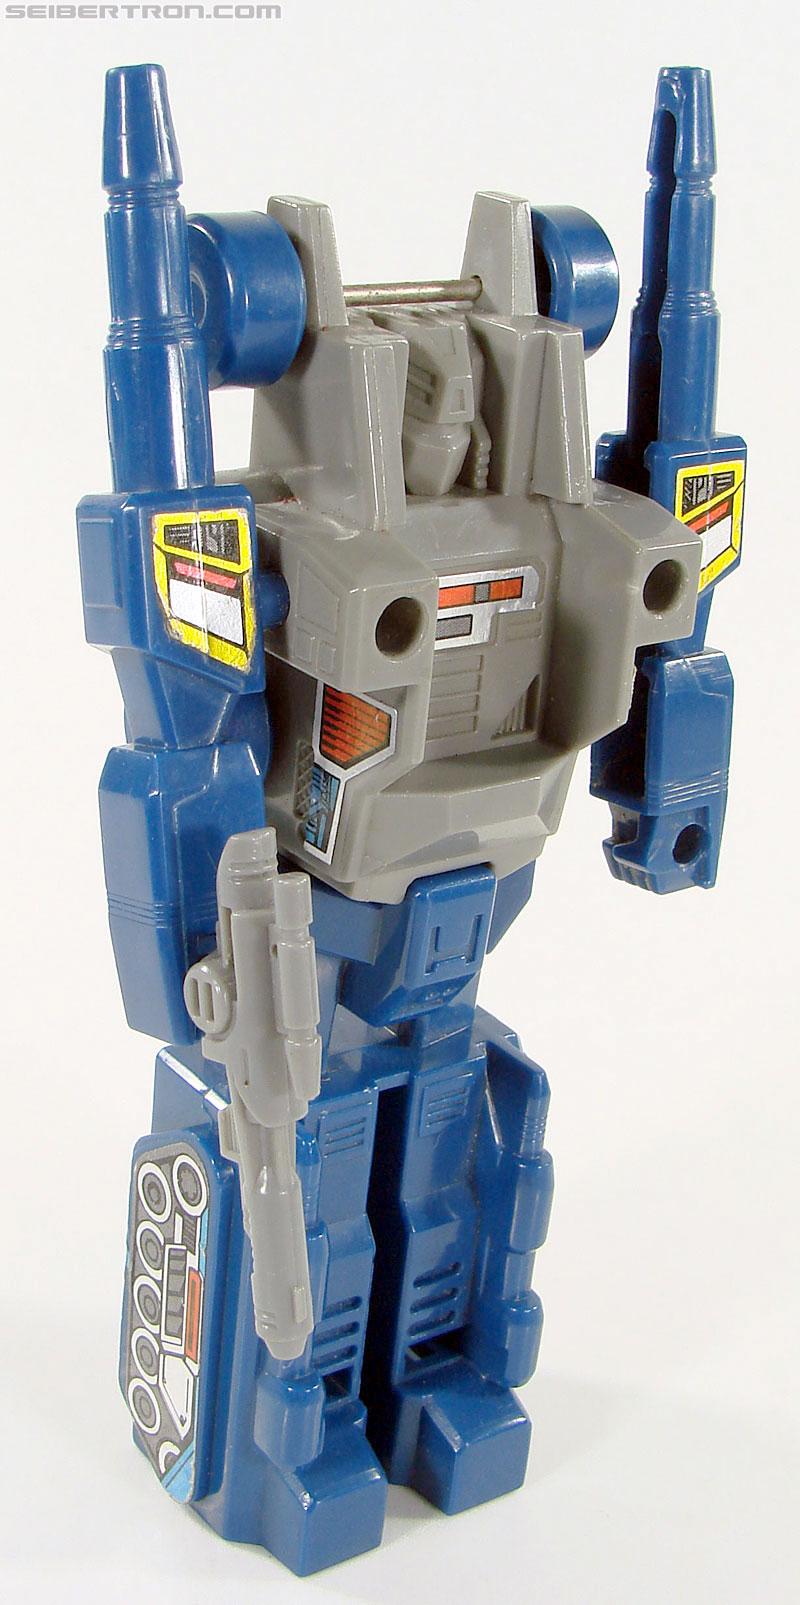 Transformers G1 1987 Grommet (Image #24 of 26)